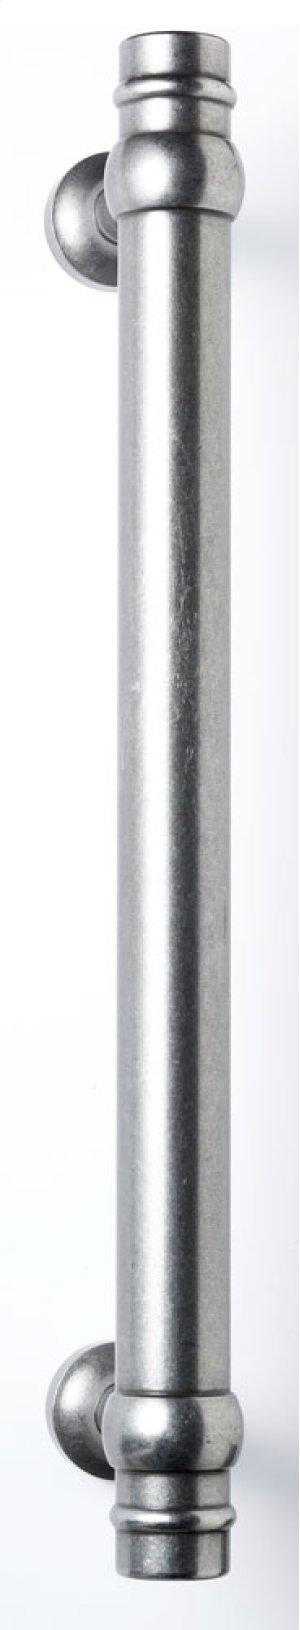 Door Pull Product Image